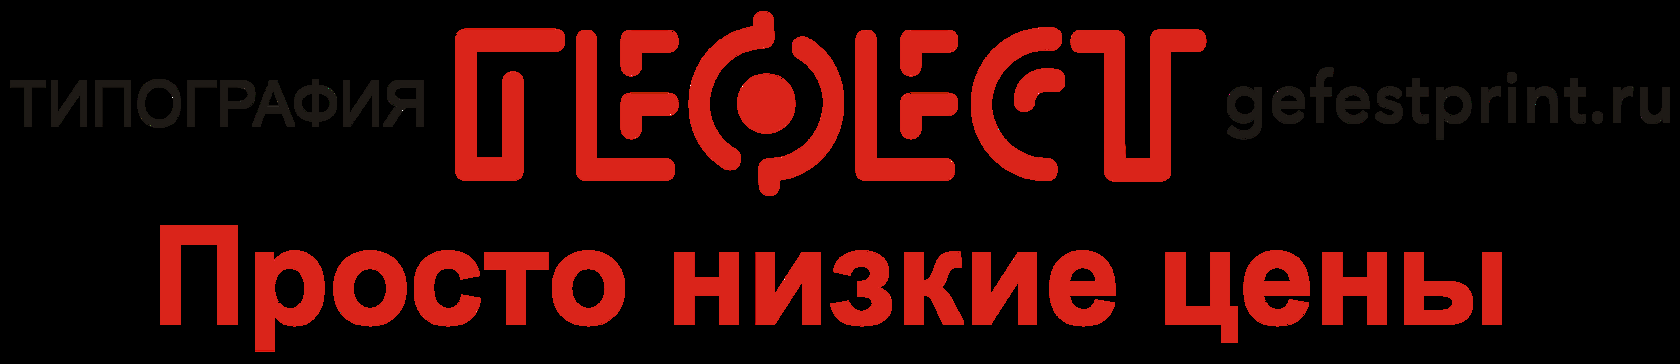 "Типография ""Гефест"""